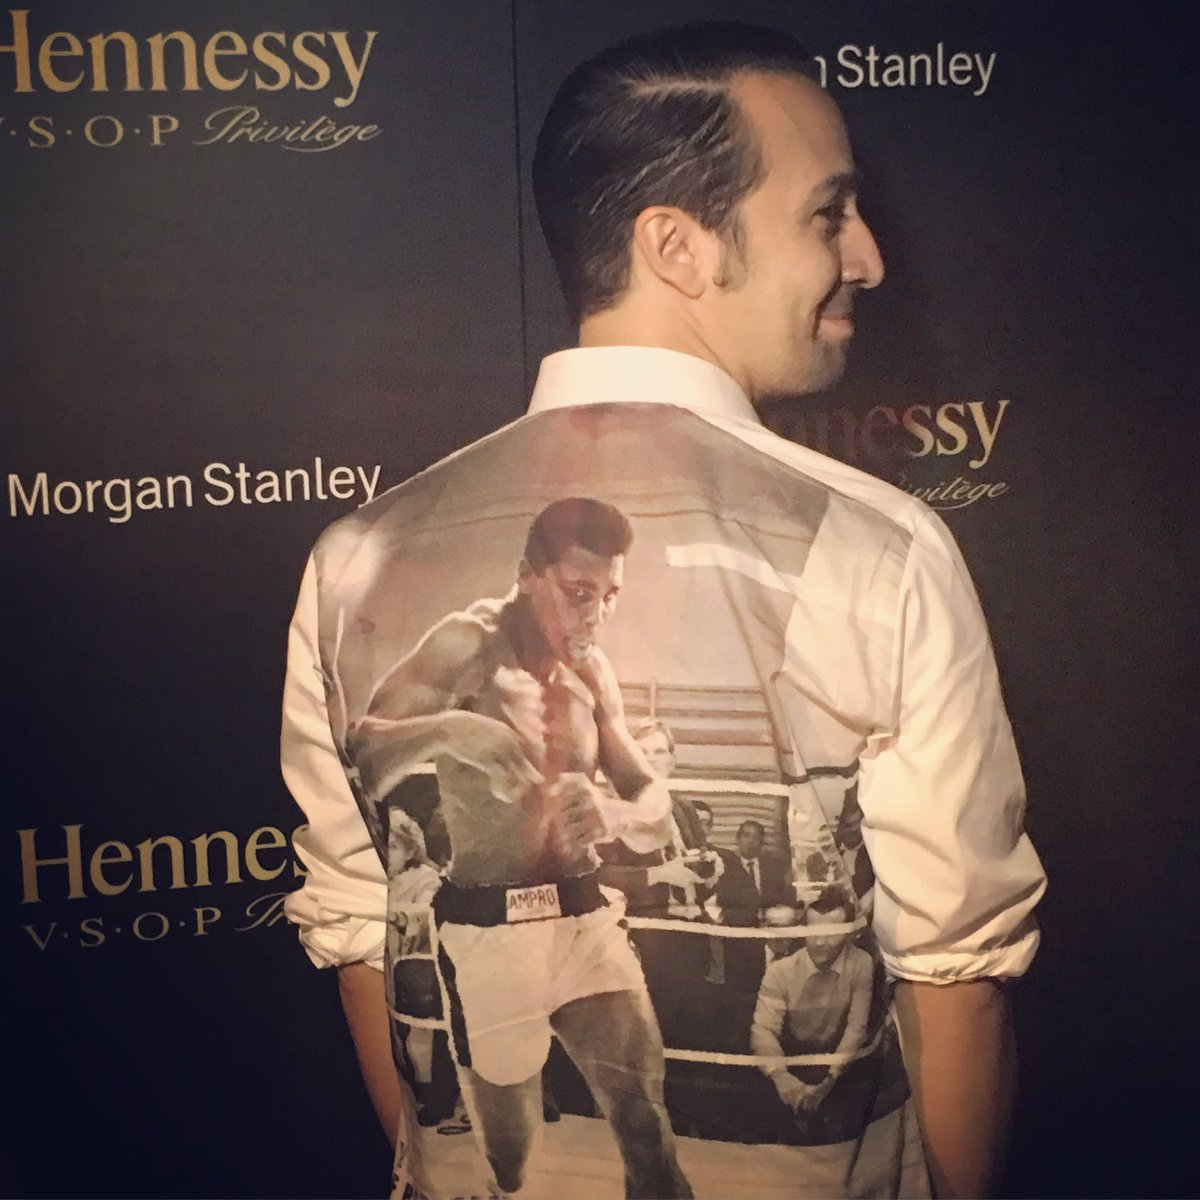 Lin-Manuel Miranda's short new haircut. #HamiltonMusical #AfterLinAfterParty https://t.co/Lq8P7AwLJI